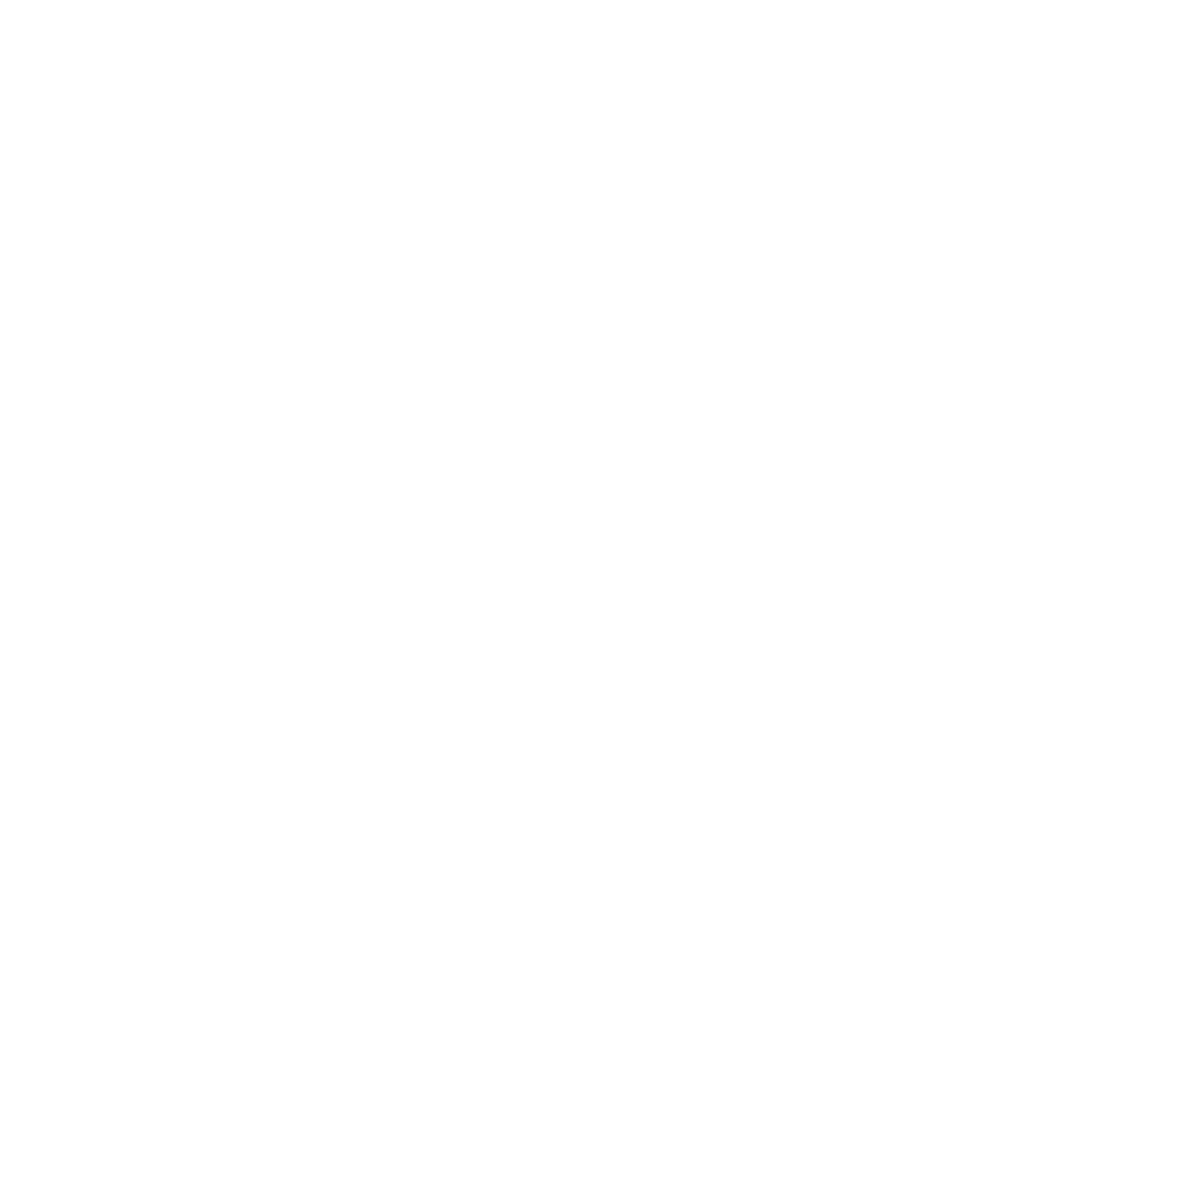 Login gmx de mein sva.wistron.com mein